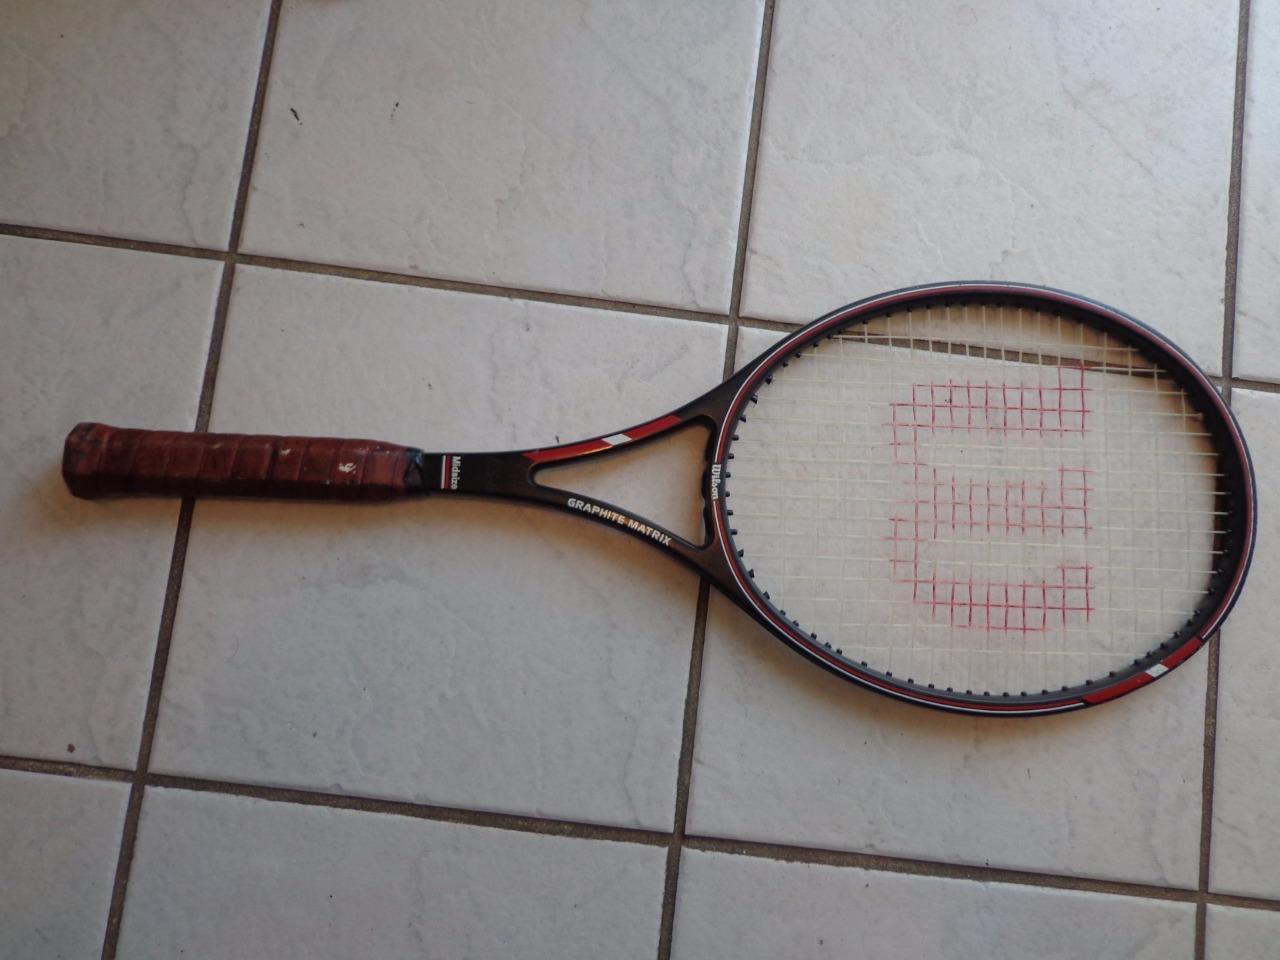 Wilson Graphite Matrix midsize 4 1 2 grip Tennis Racquet